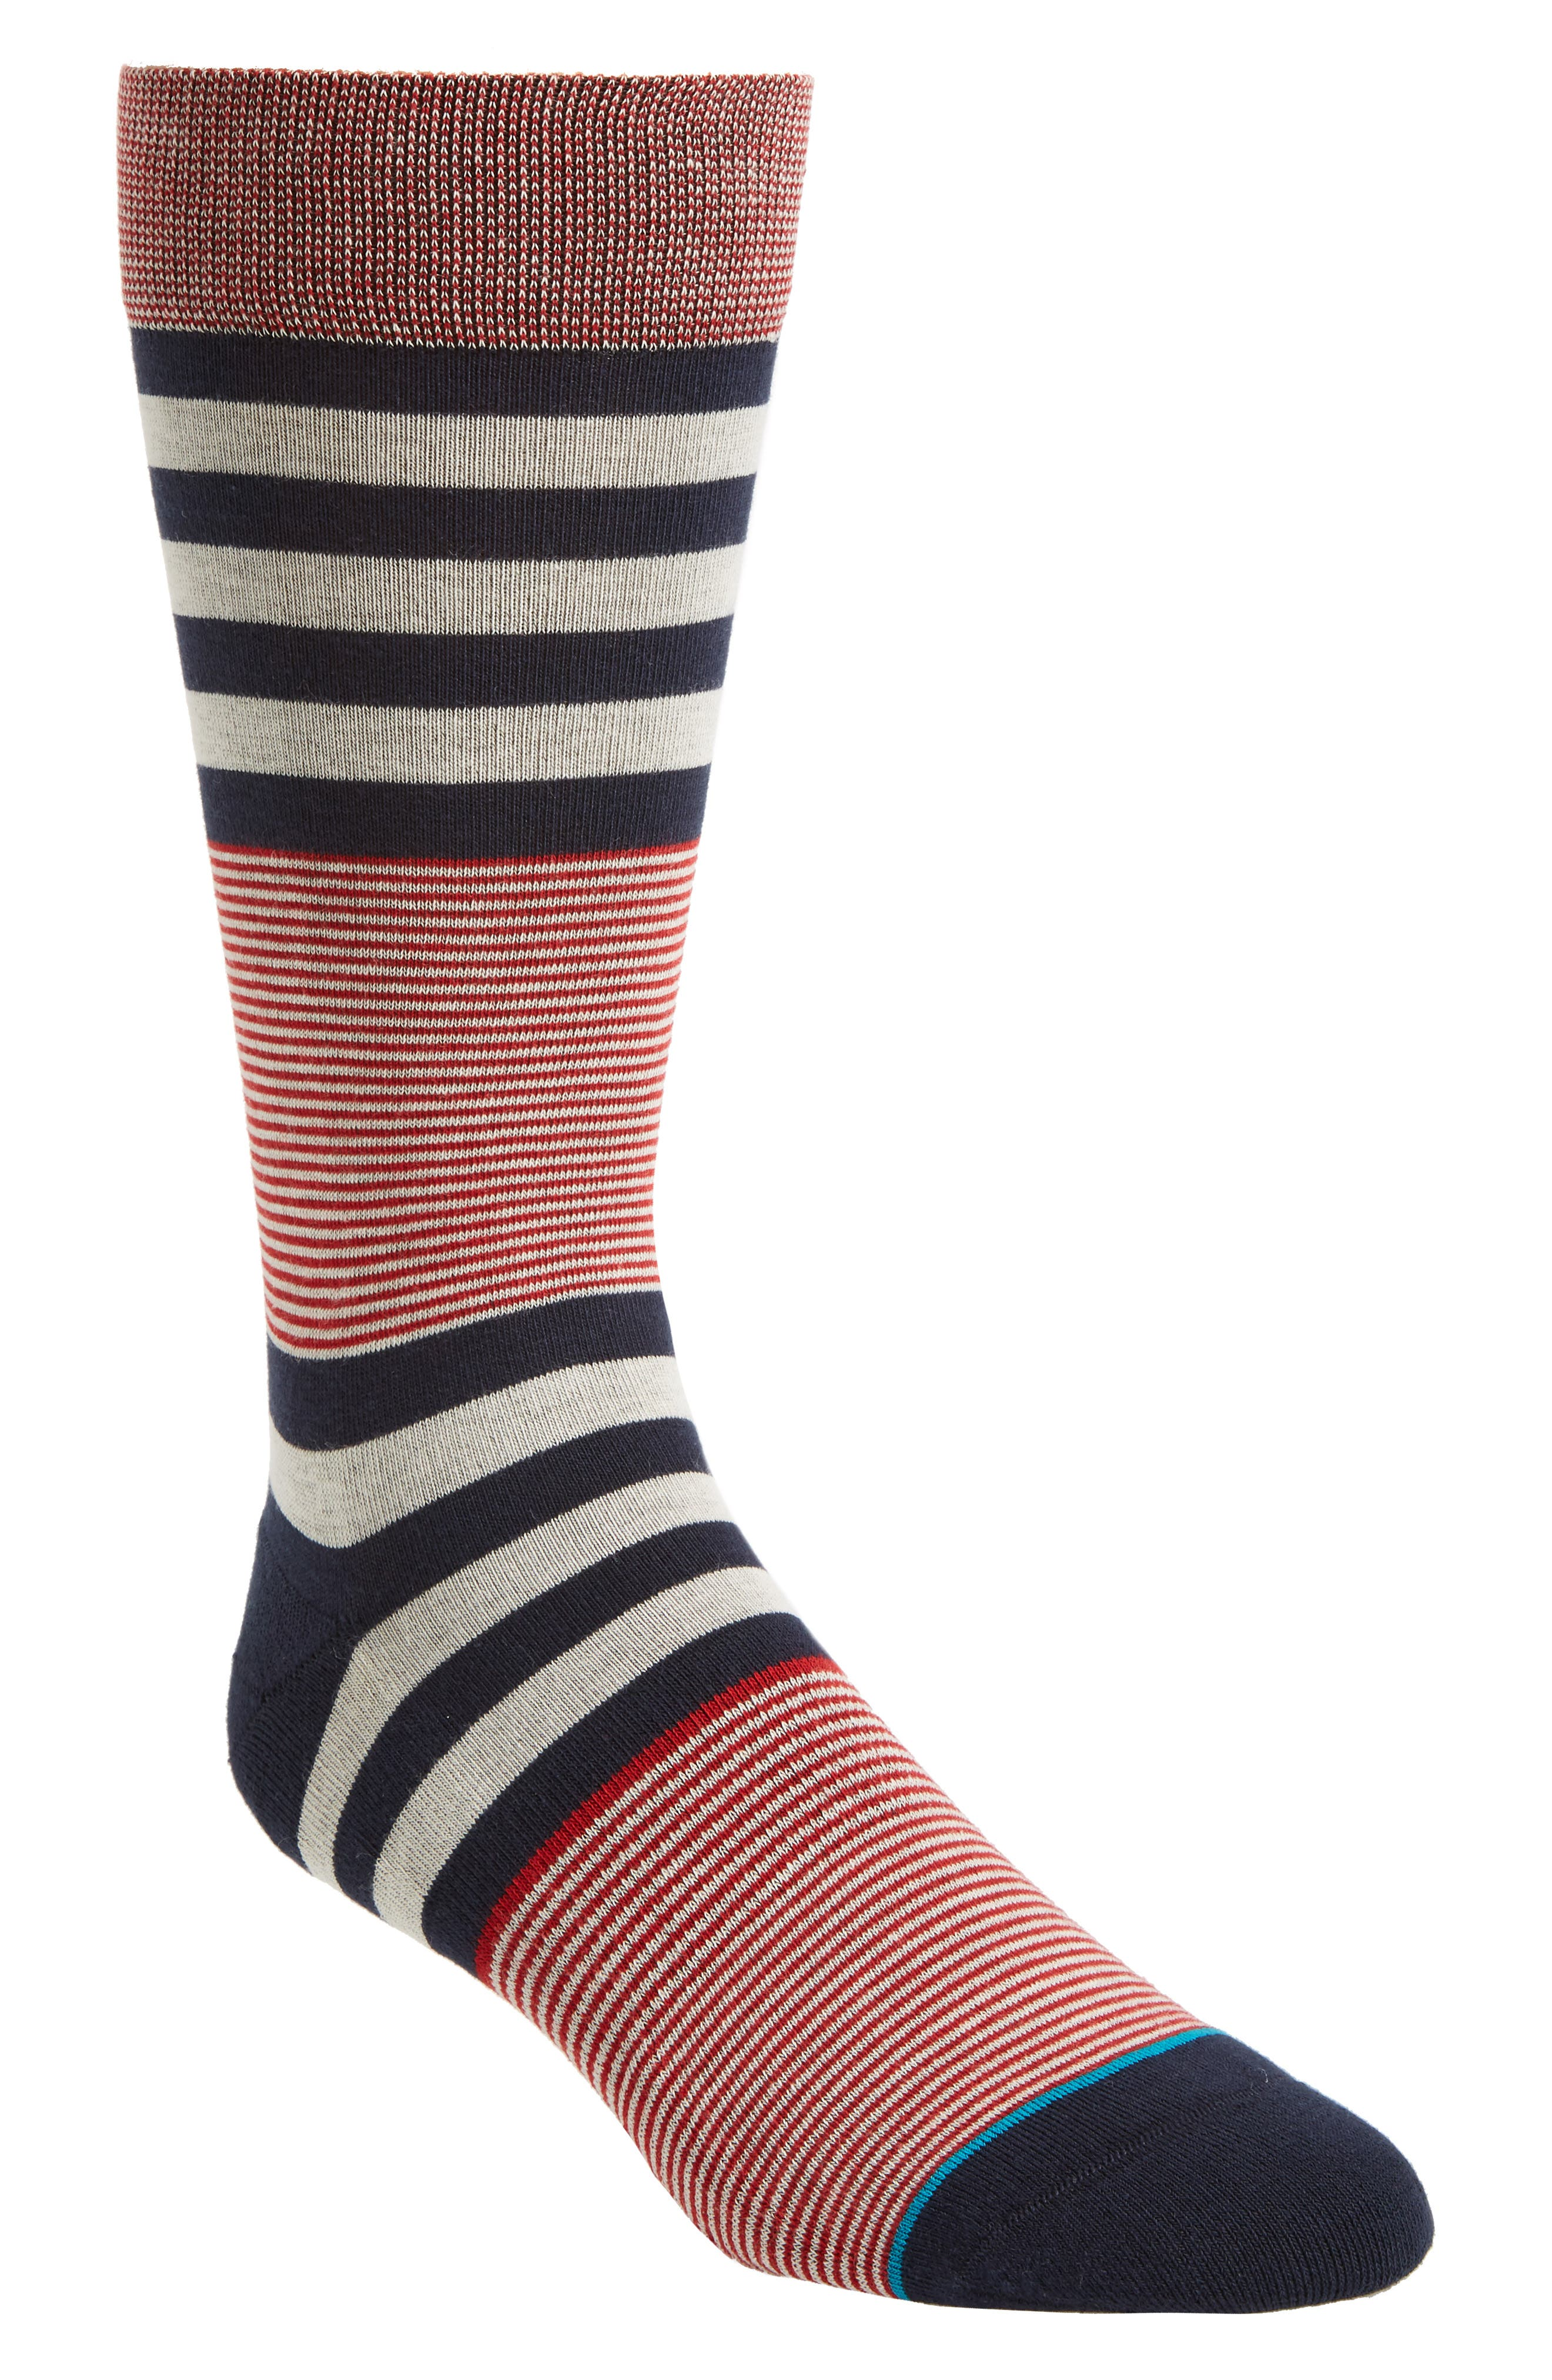 Americanas Socks,                             Main thumbnail 1, color,                             007